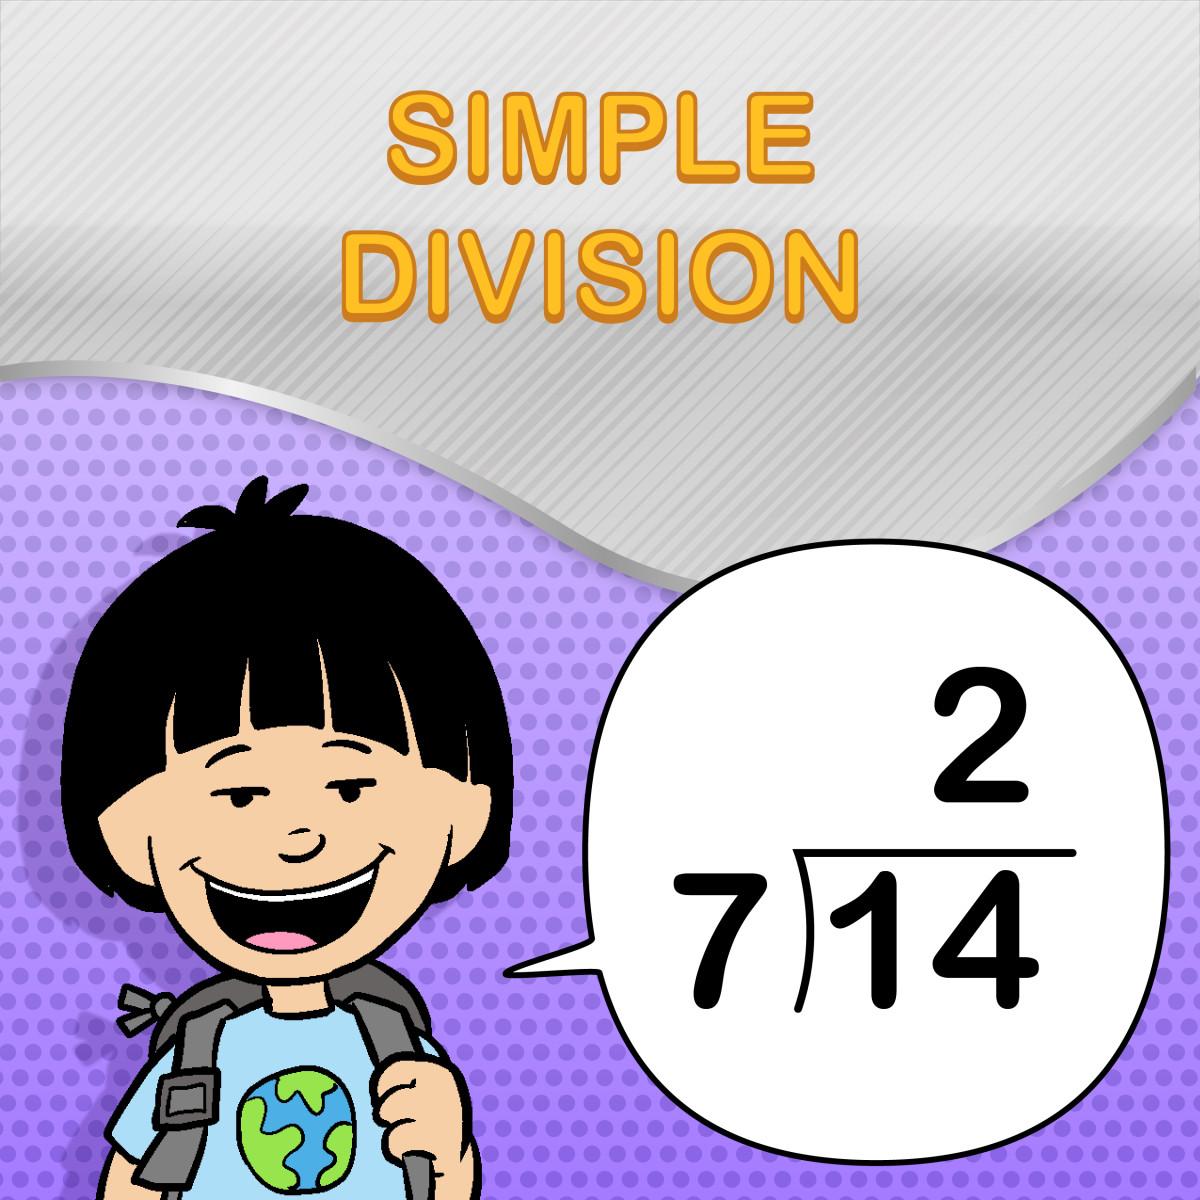 Simple Division Worksheets For Kids